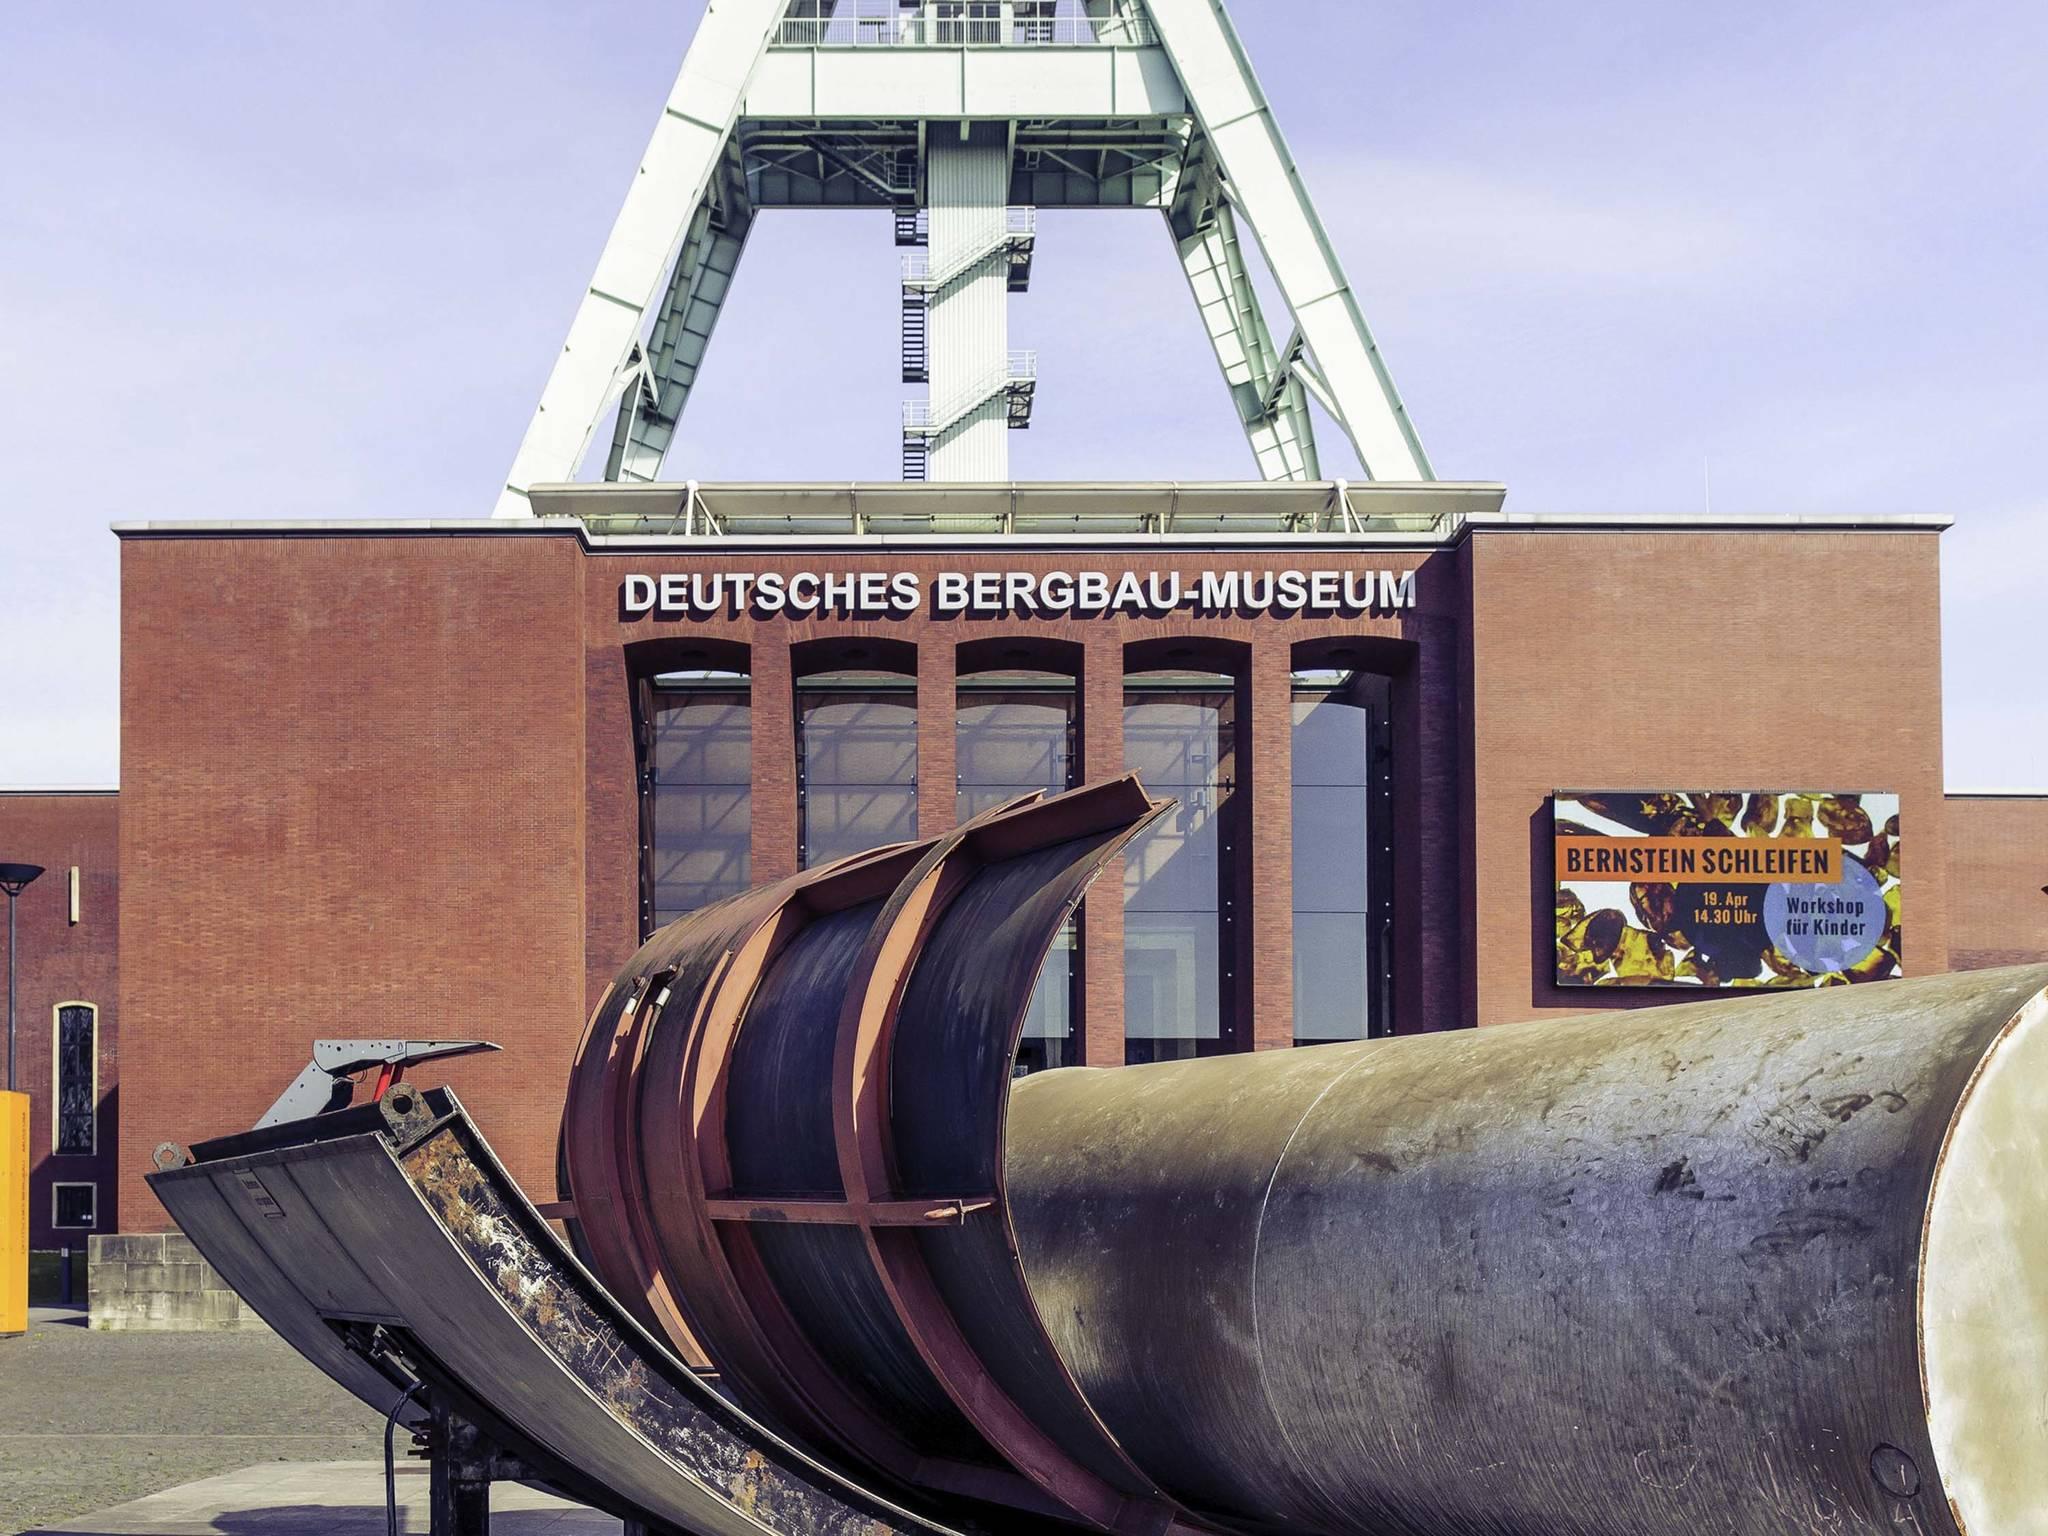 30 Luxus Park Inn Bochum Bilder